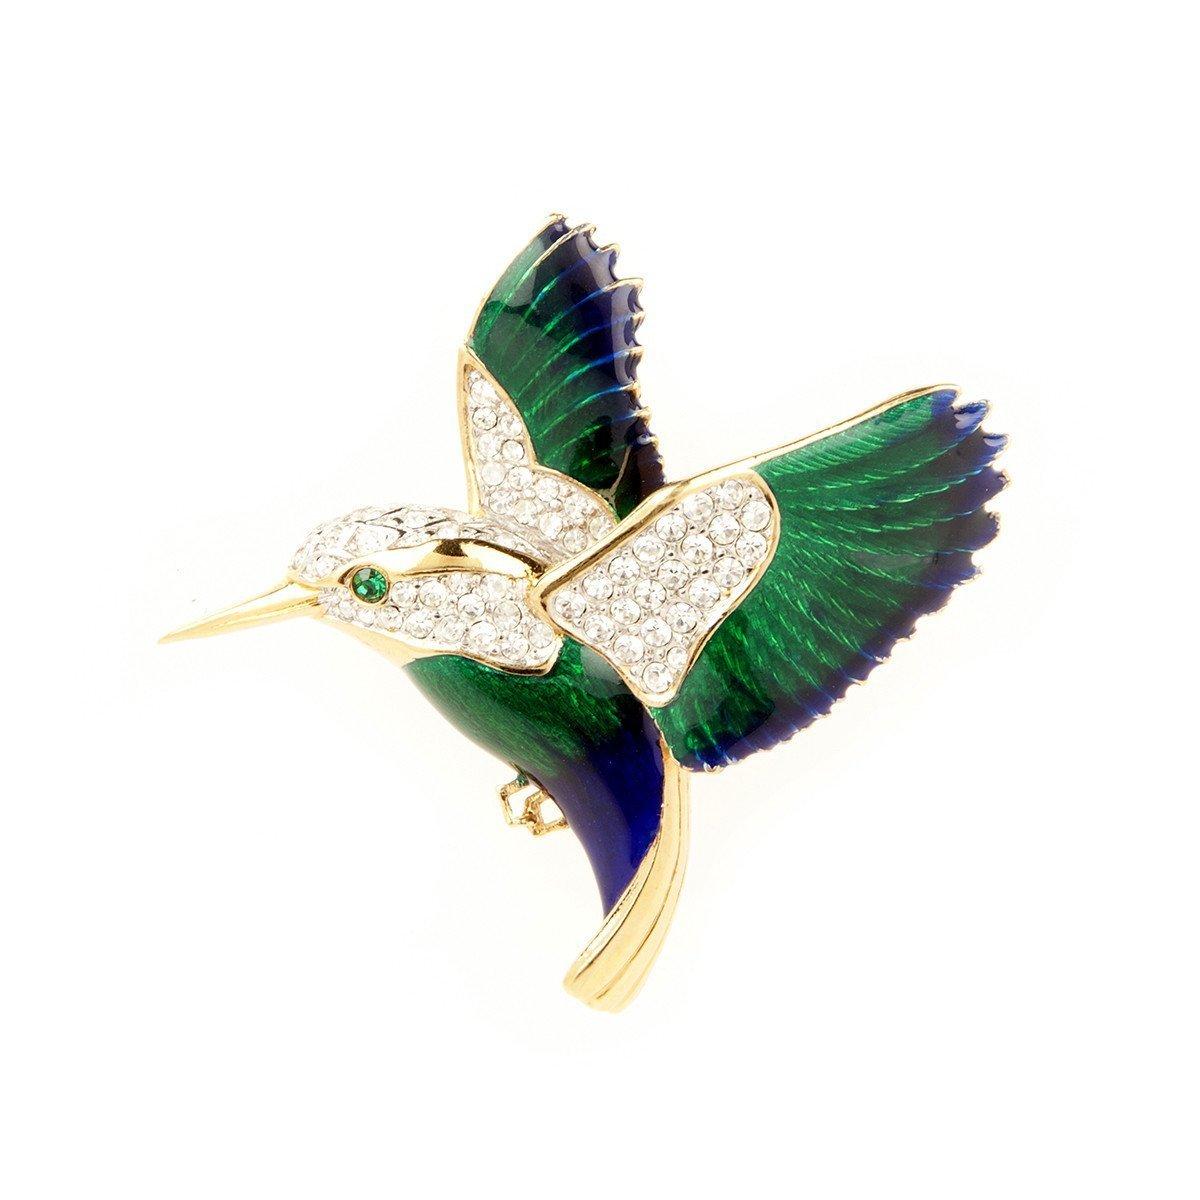 1960S VINTAGE ATTWOOD & SAWYER HUMMINGBIRD BROOCH